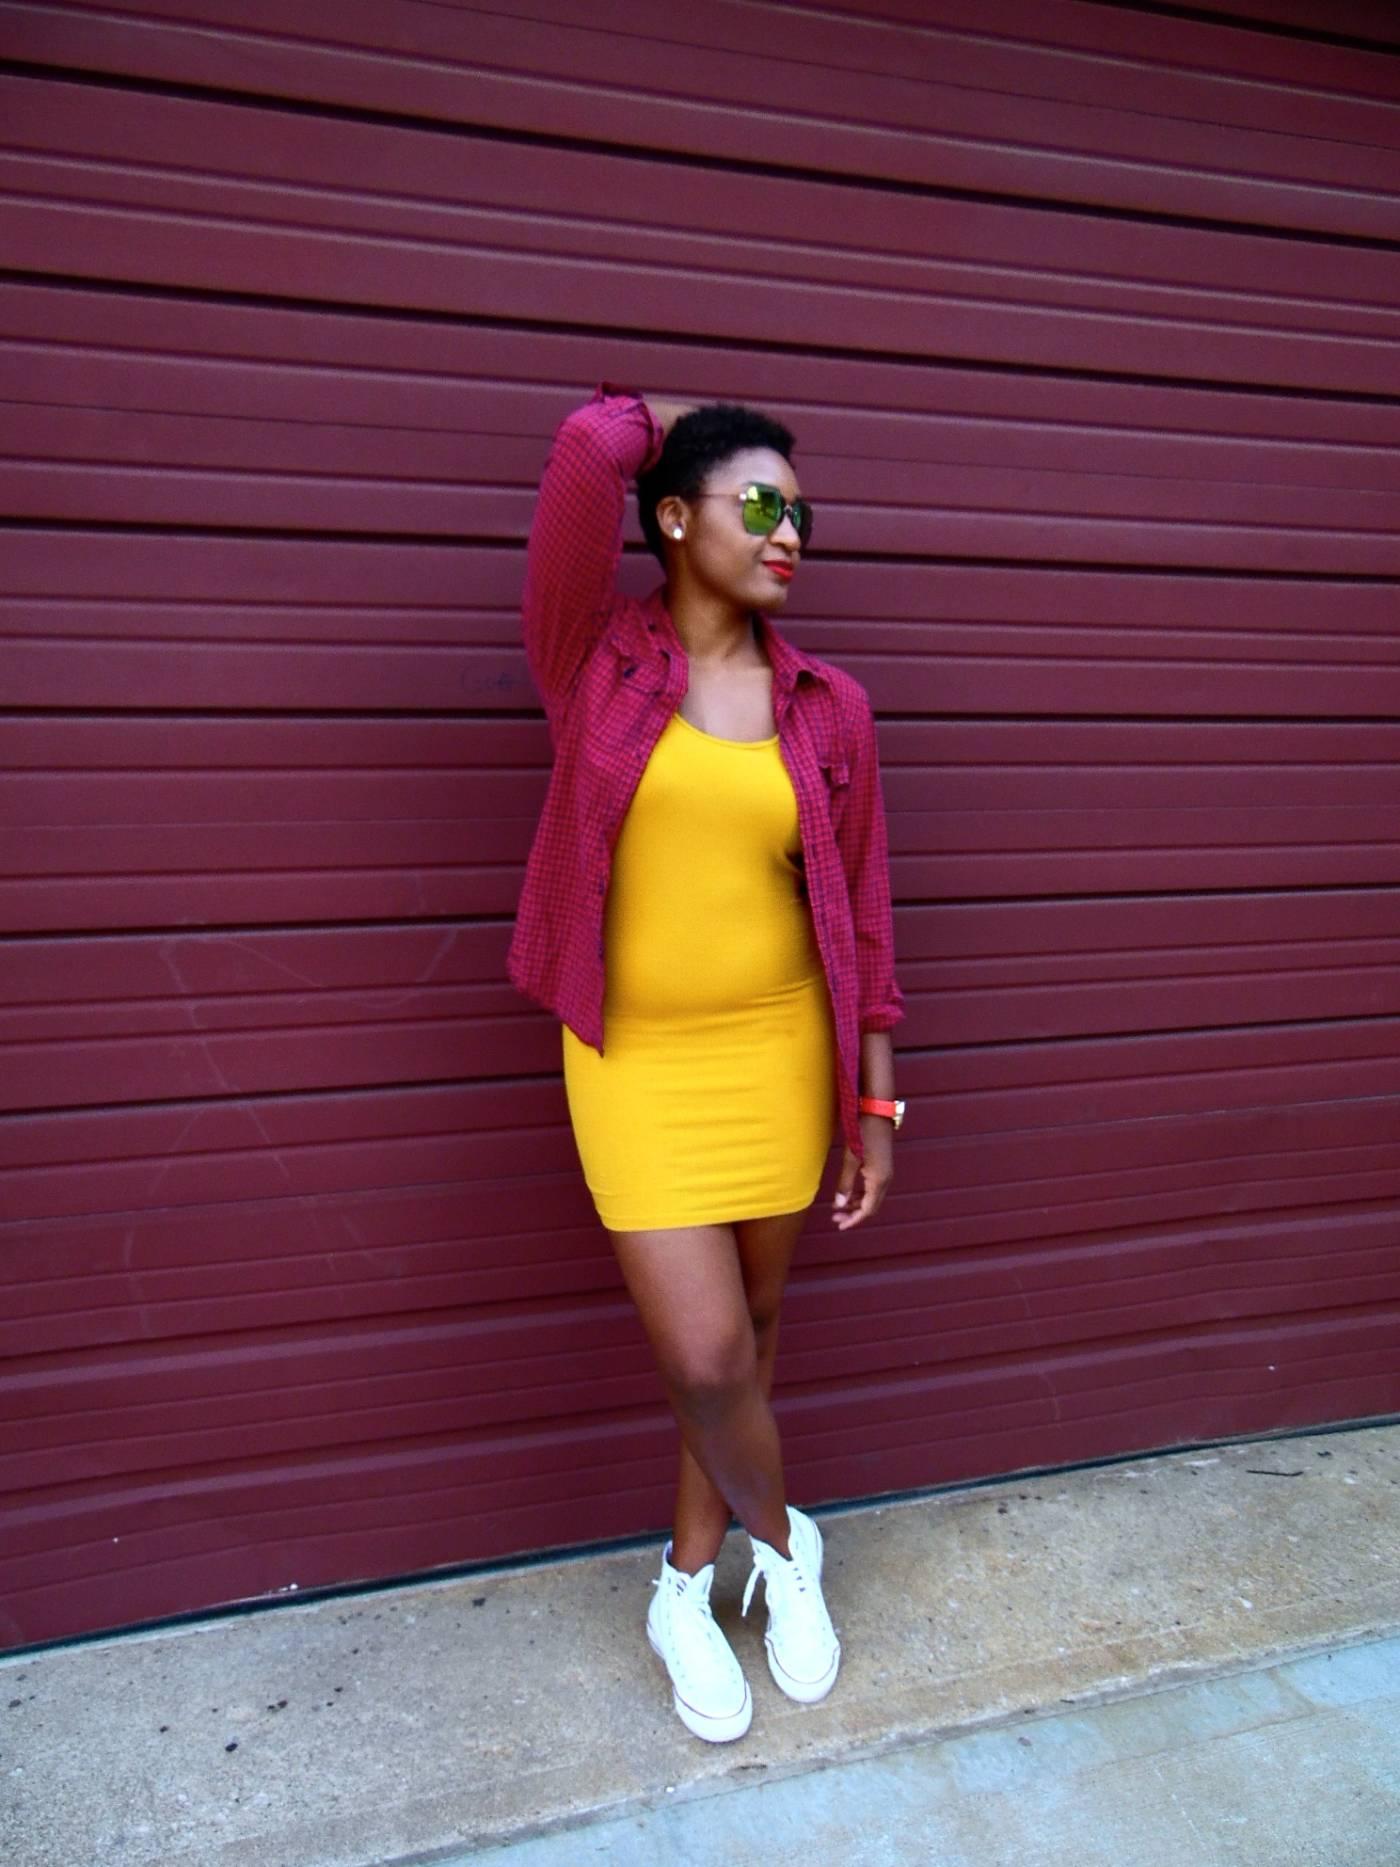 jasmine diane Yellow Dress + Red Plaid